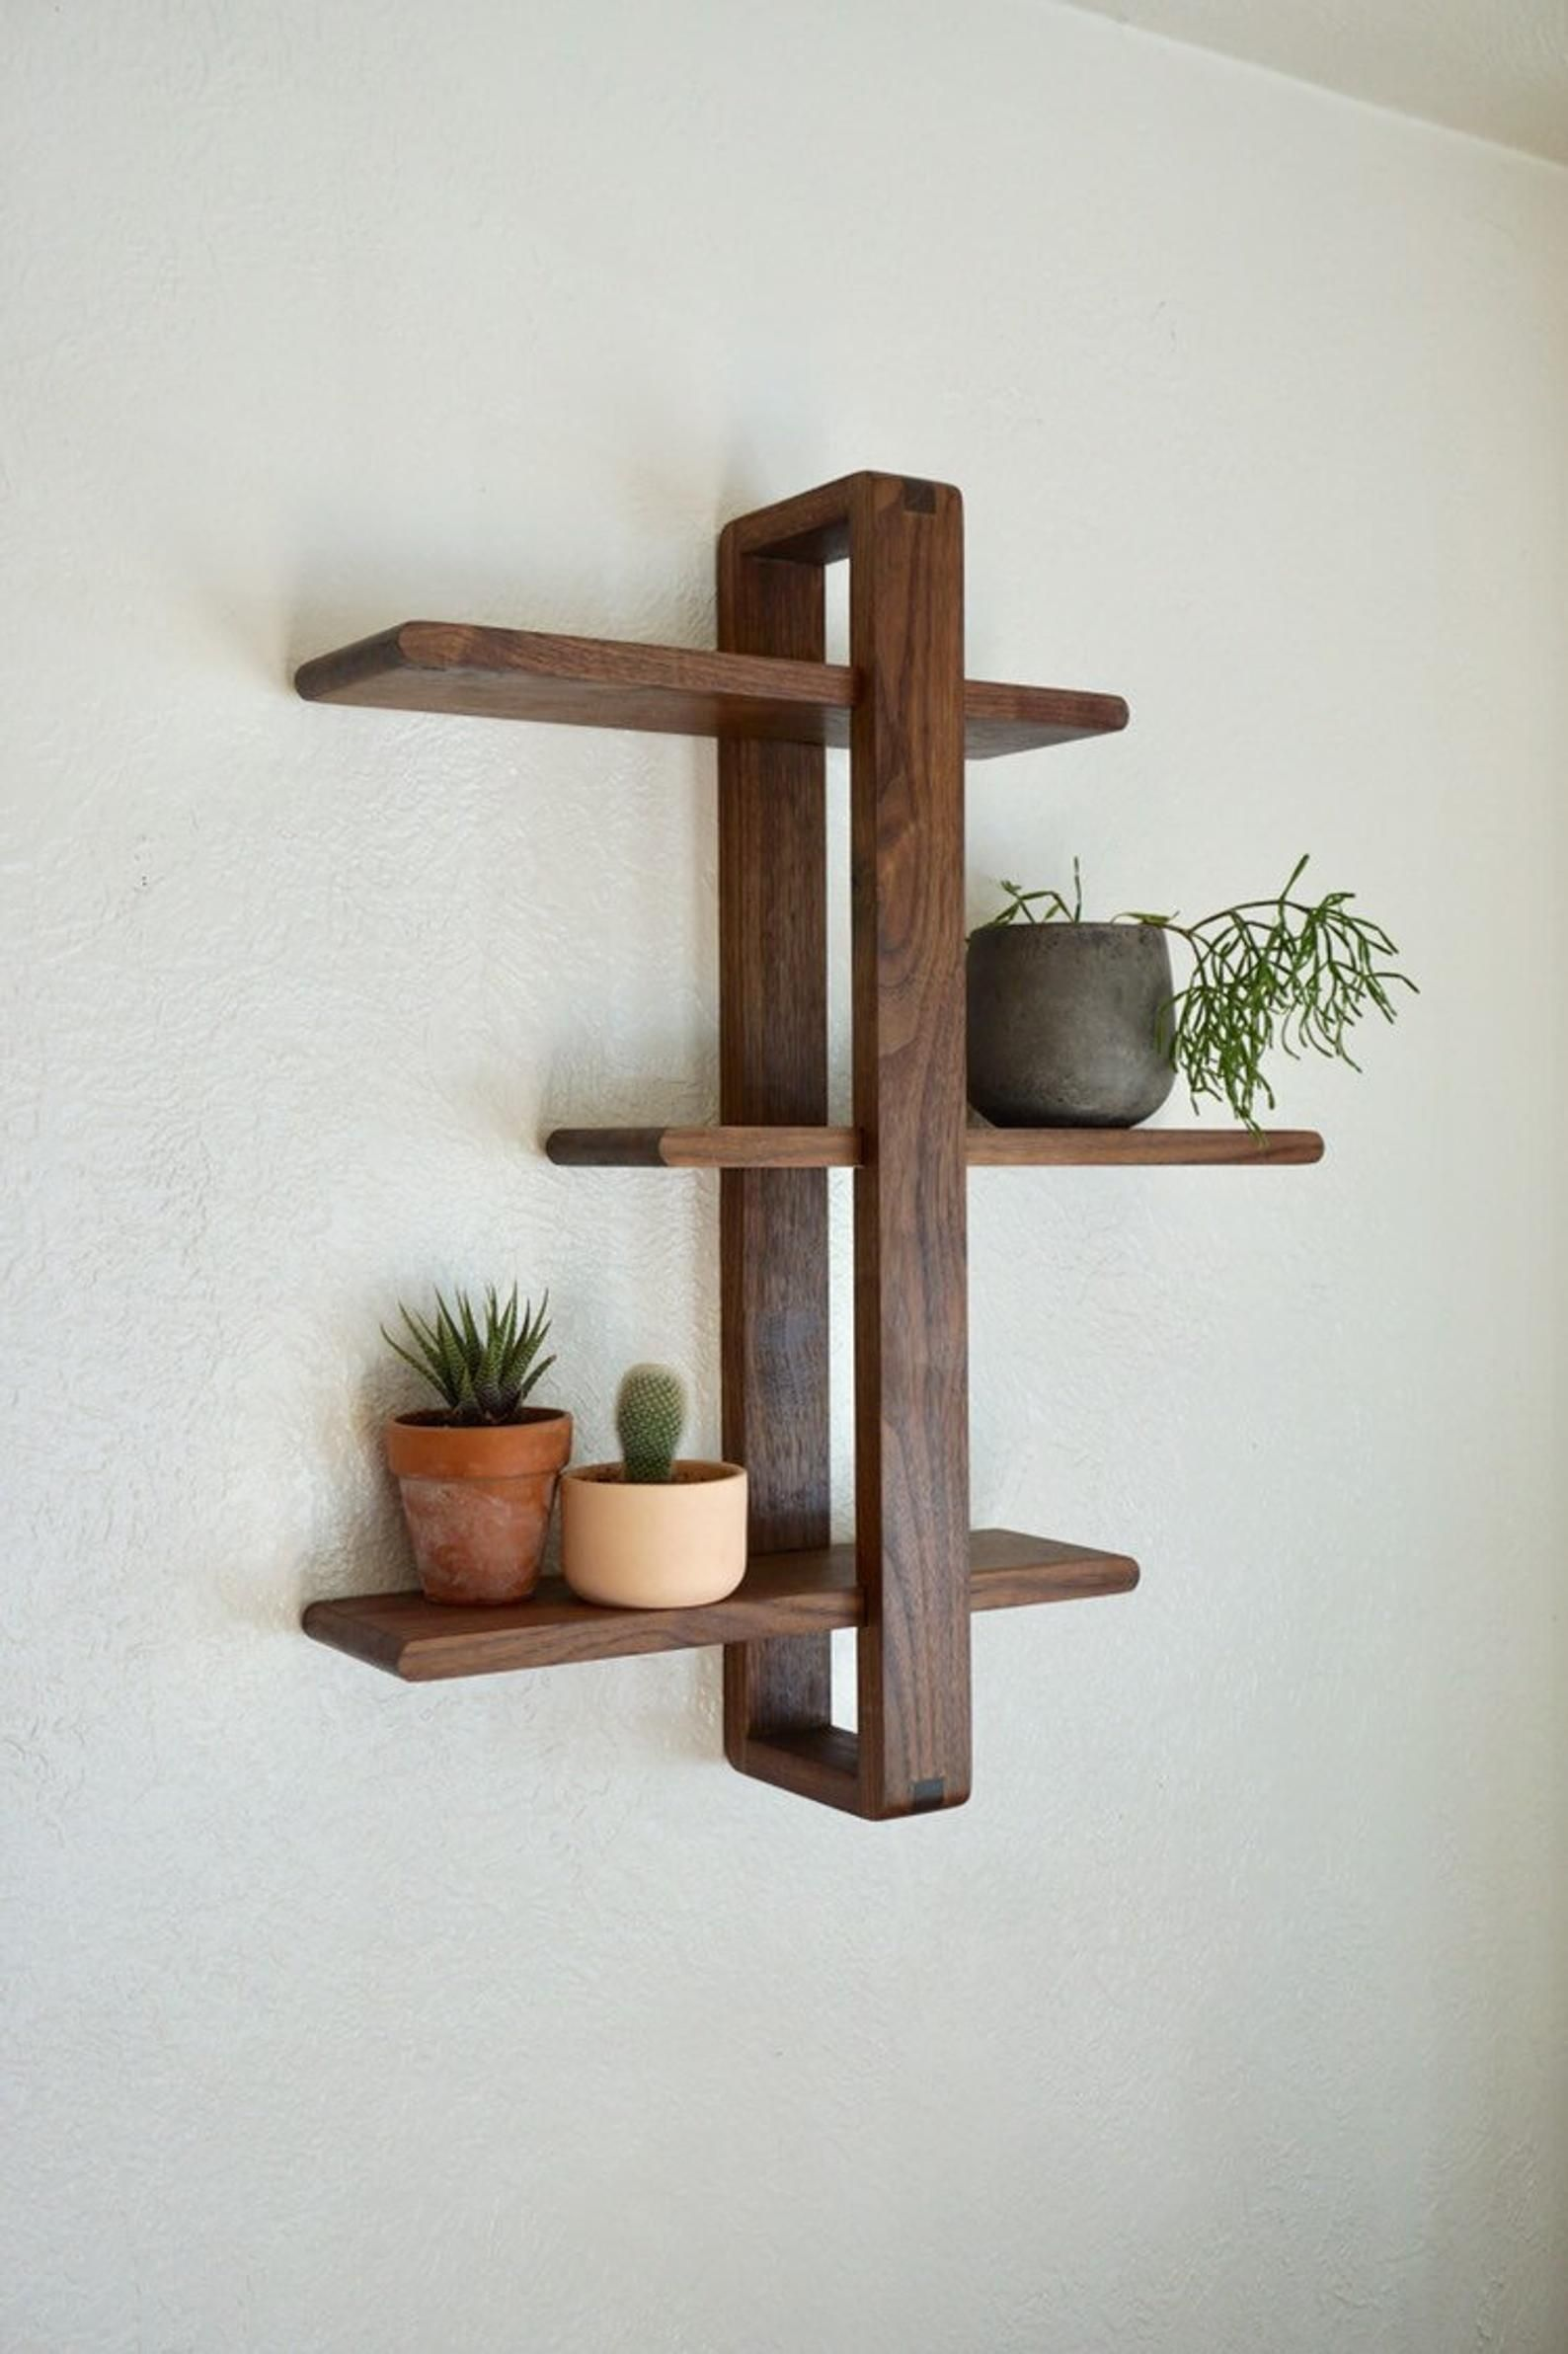 Shift Shelf Modern Wall Shelf, Solid Walnut for Hanging